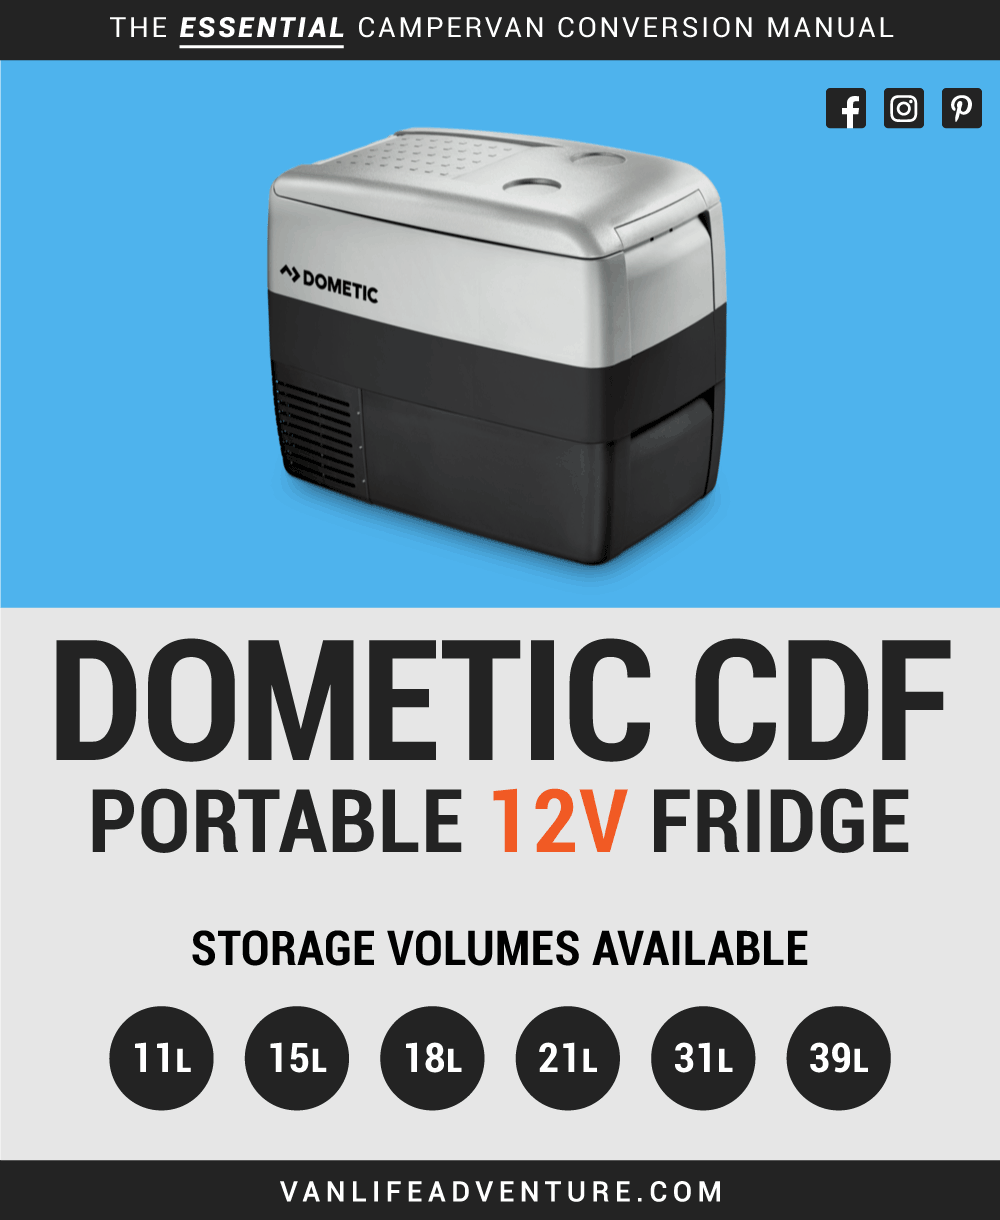 Dometic CDF Fridge for a Campervan, RV, Motorhome or Campervan.